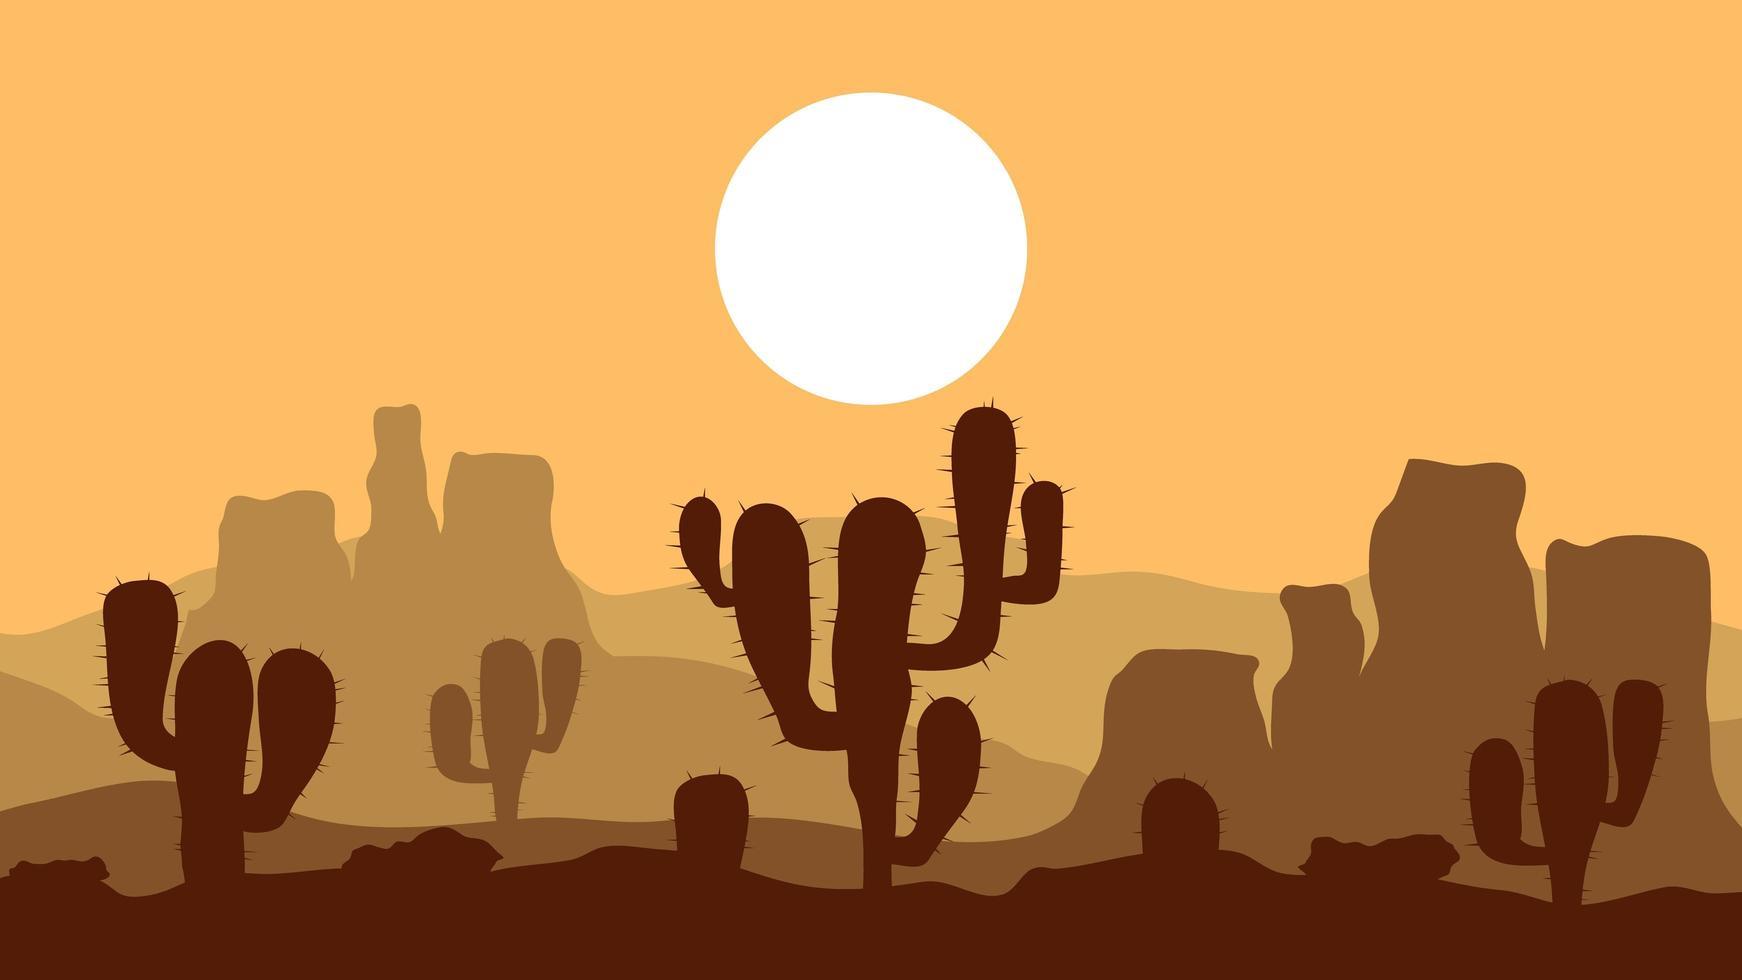 öken solnedgång lanscape vektor